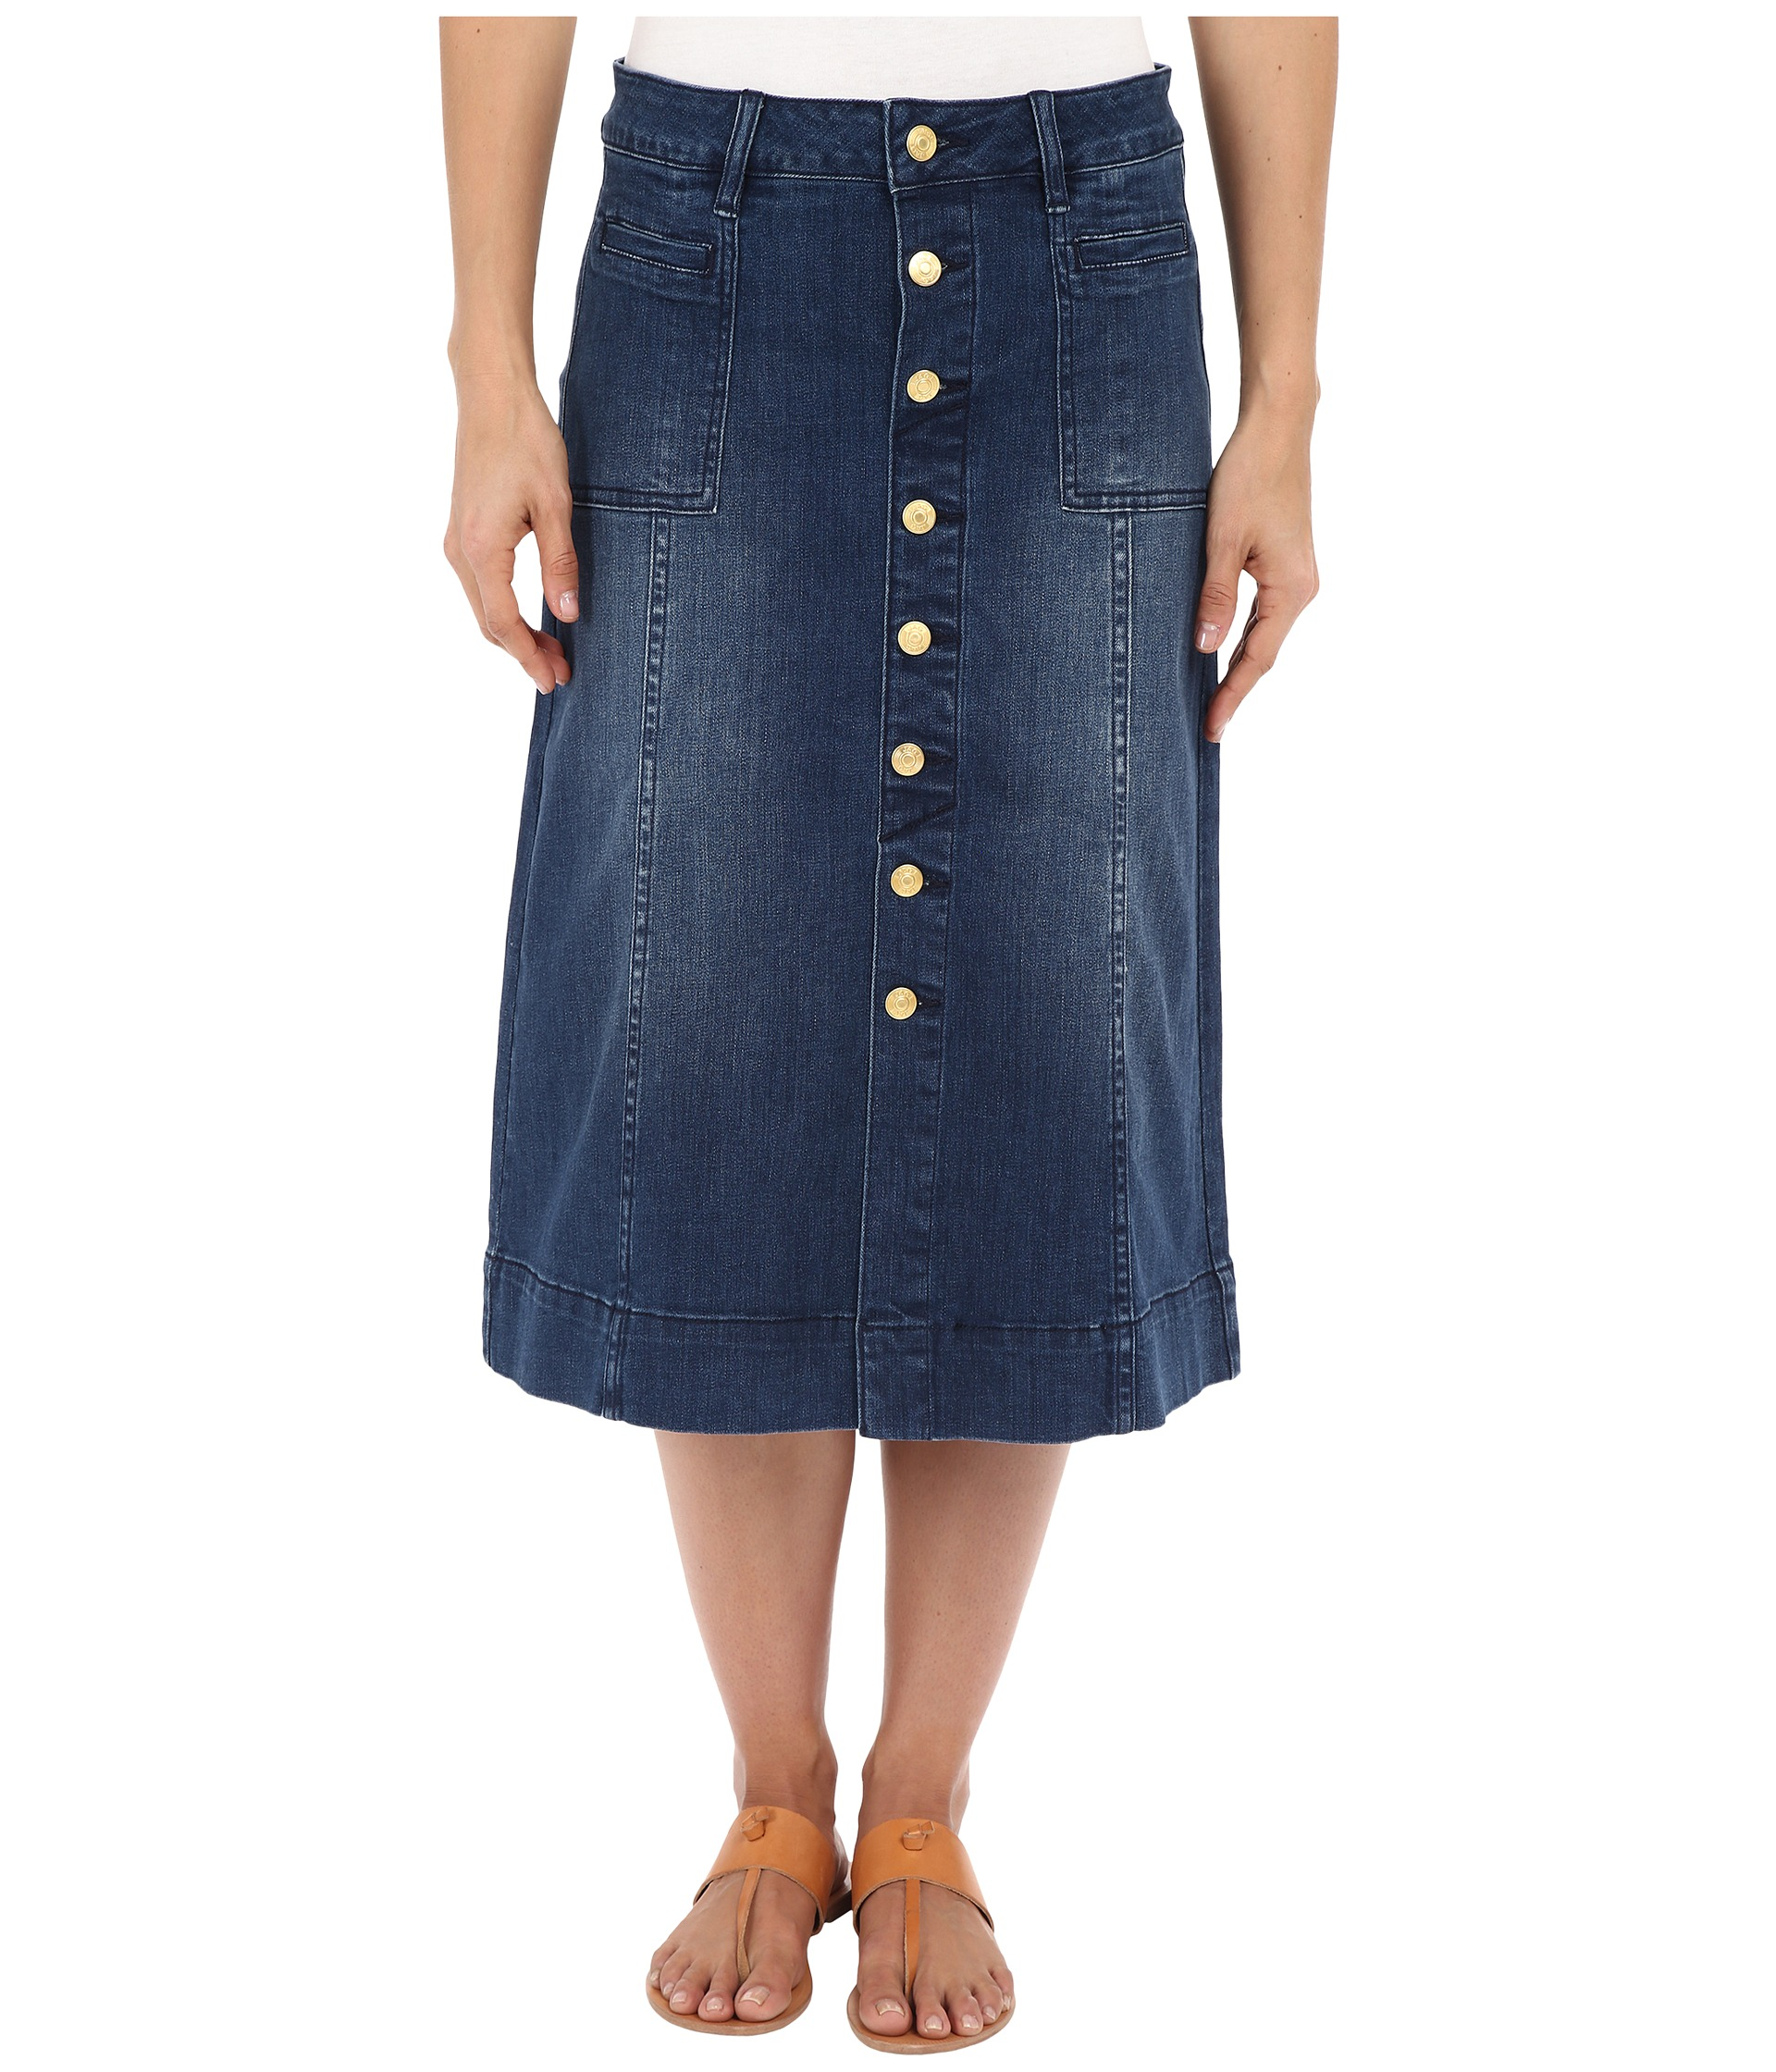 jag barrett button front denim skirt zappos